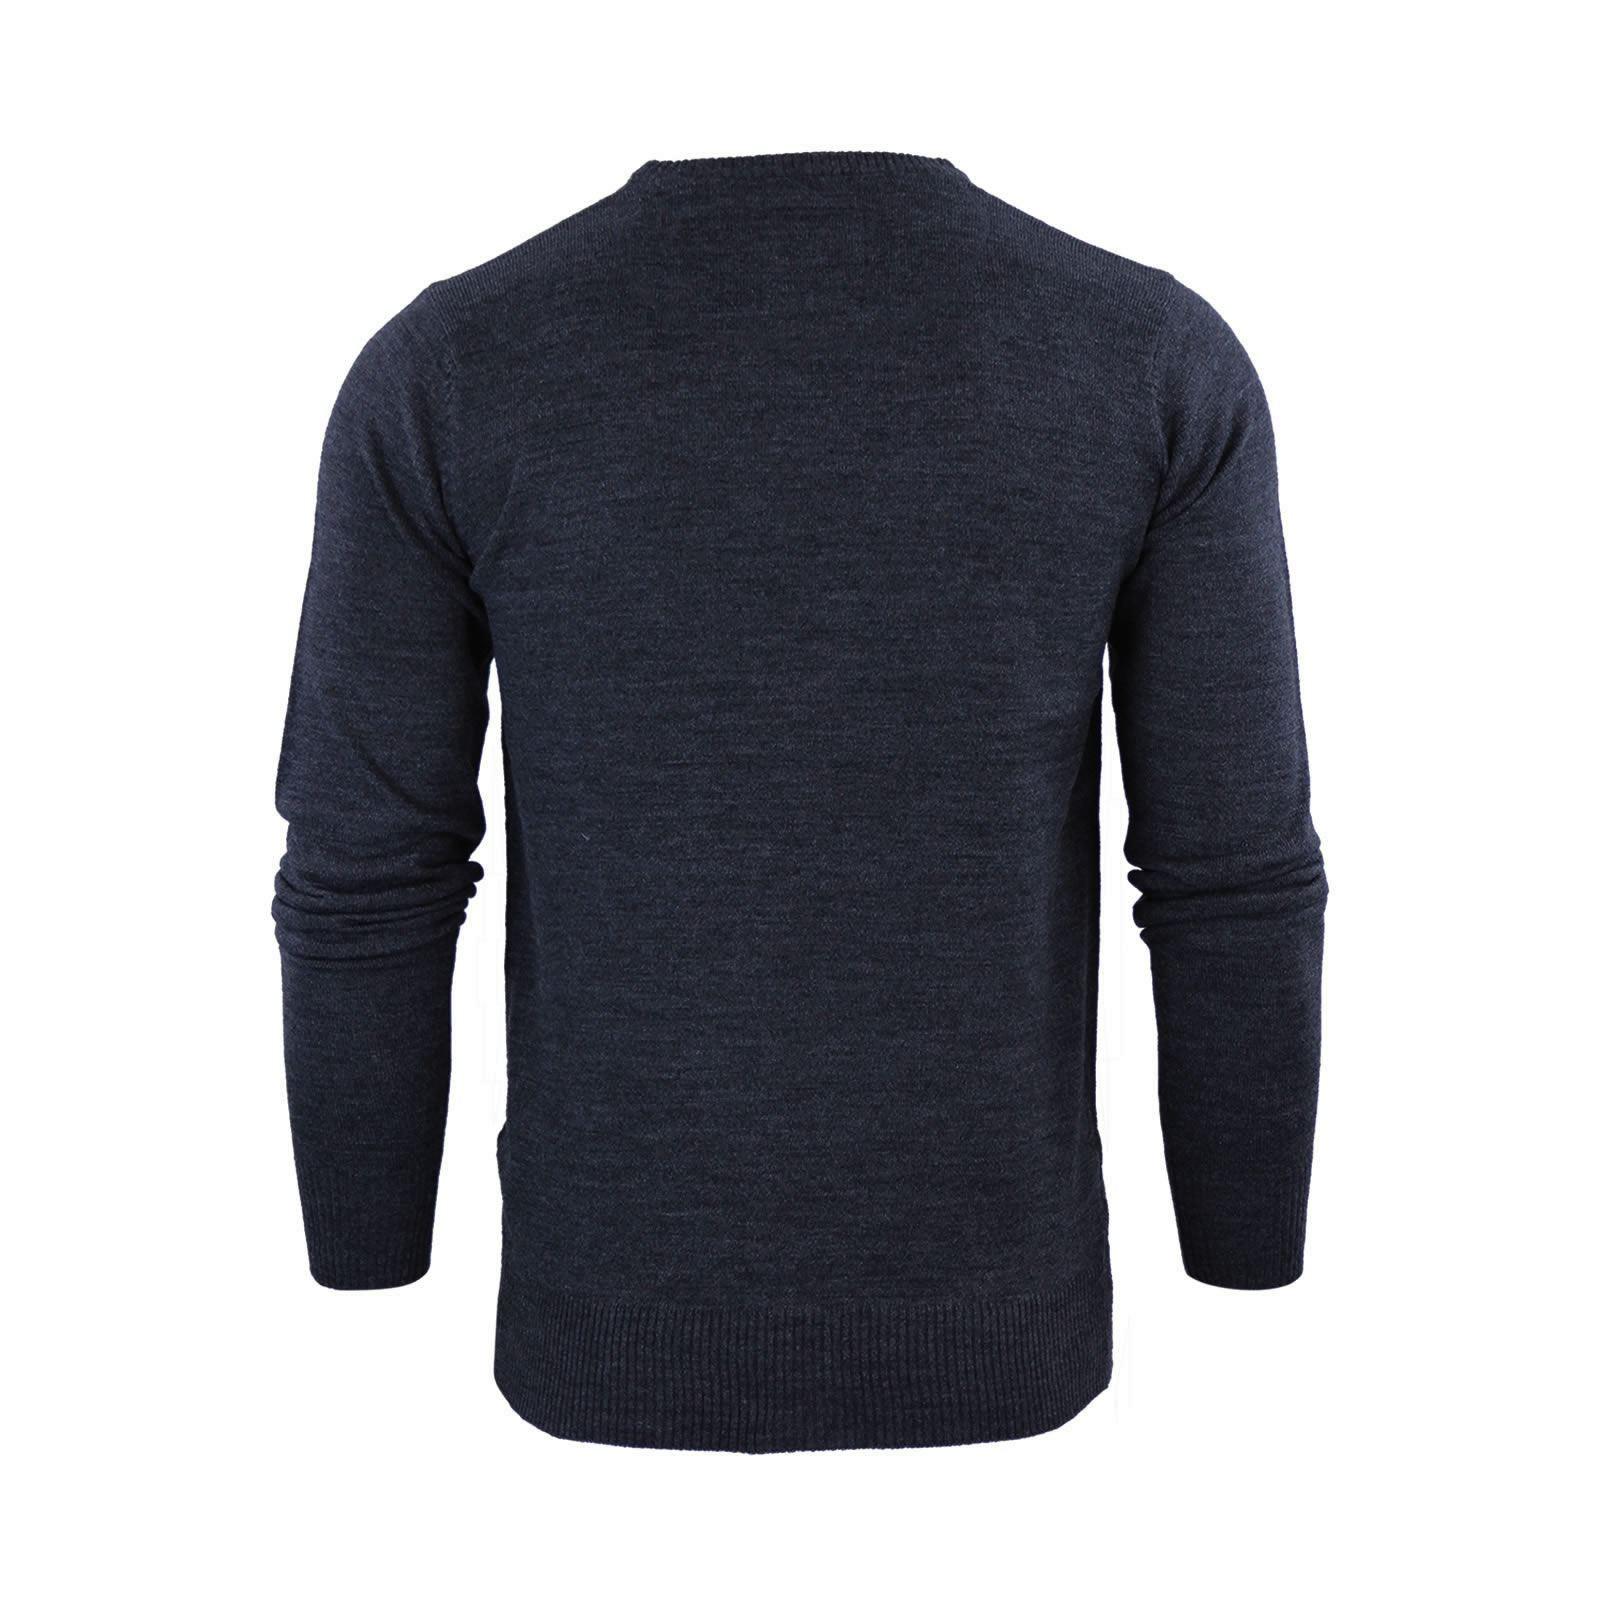 Mens-Jumper-Brave-Soul-Urbain-Knitted-Crew-Neck-Sweater thumbnail 33